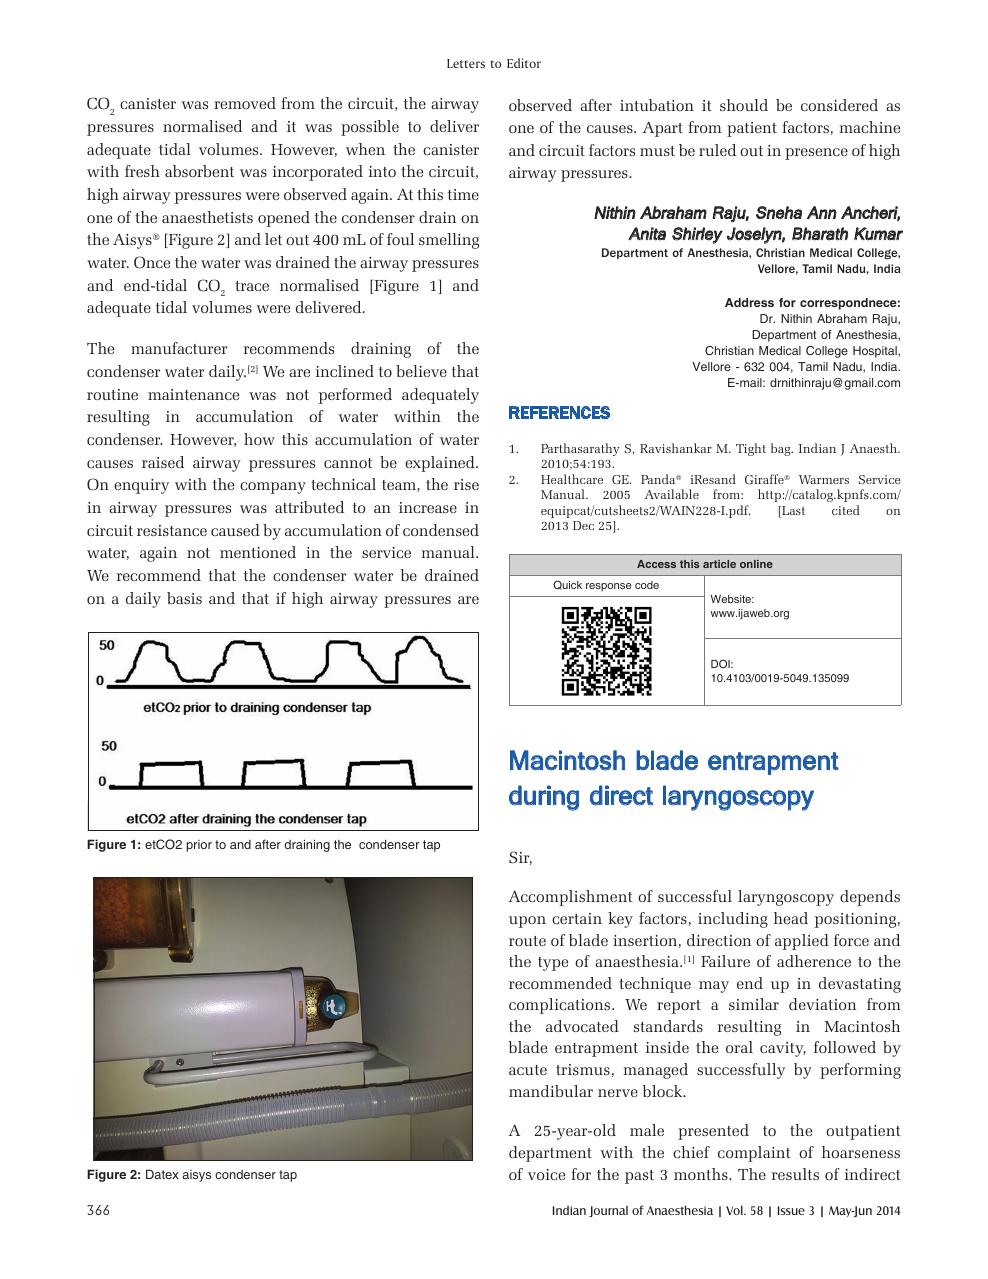 Macintosh blade entrapment during direct laryngoscopy – topic of